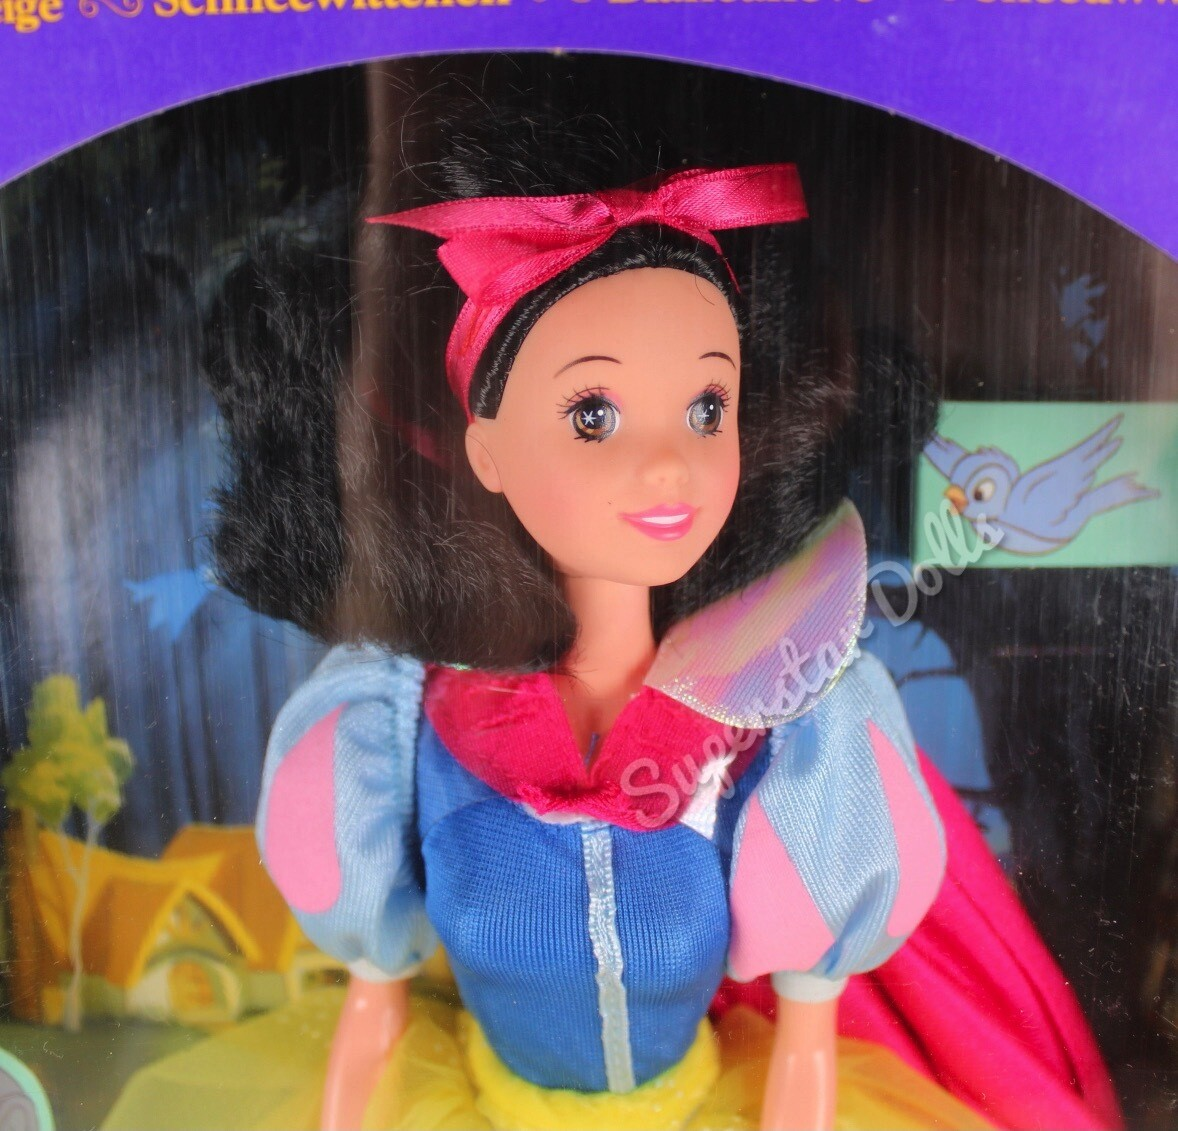 1992 Disney Classics: Snow White from Snow White & the Seven Dwarfs Fashion Doll By Mattel